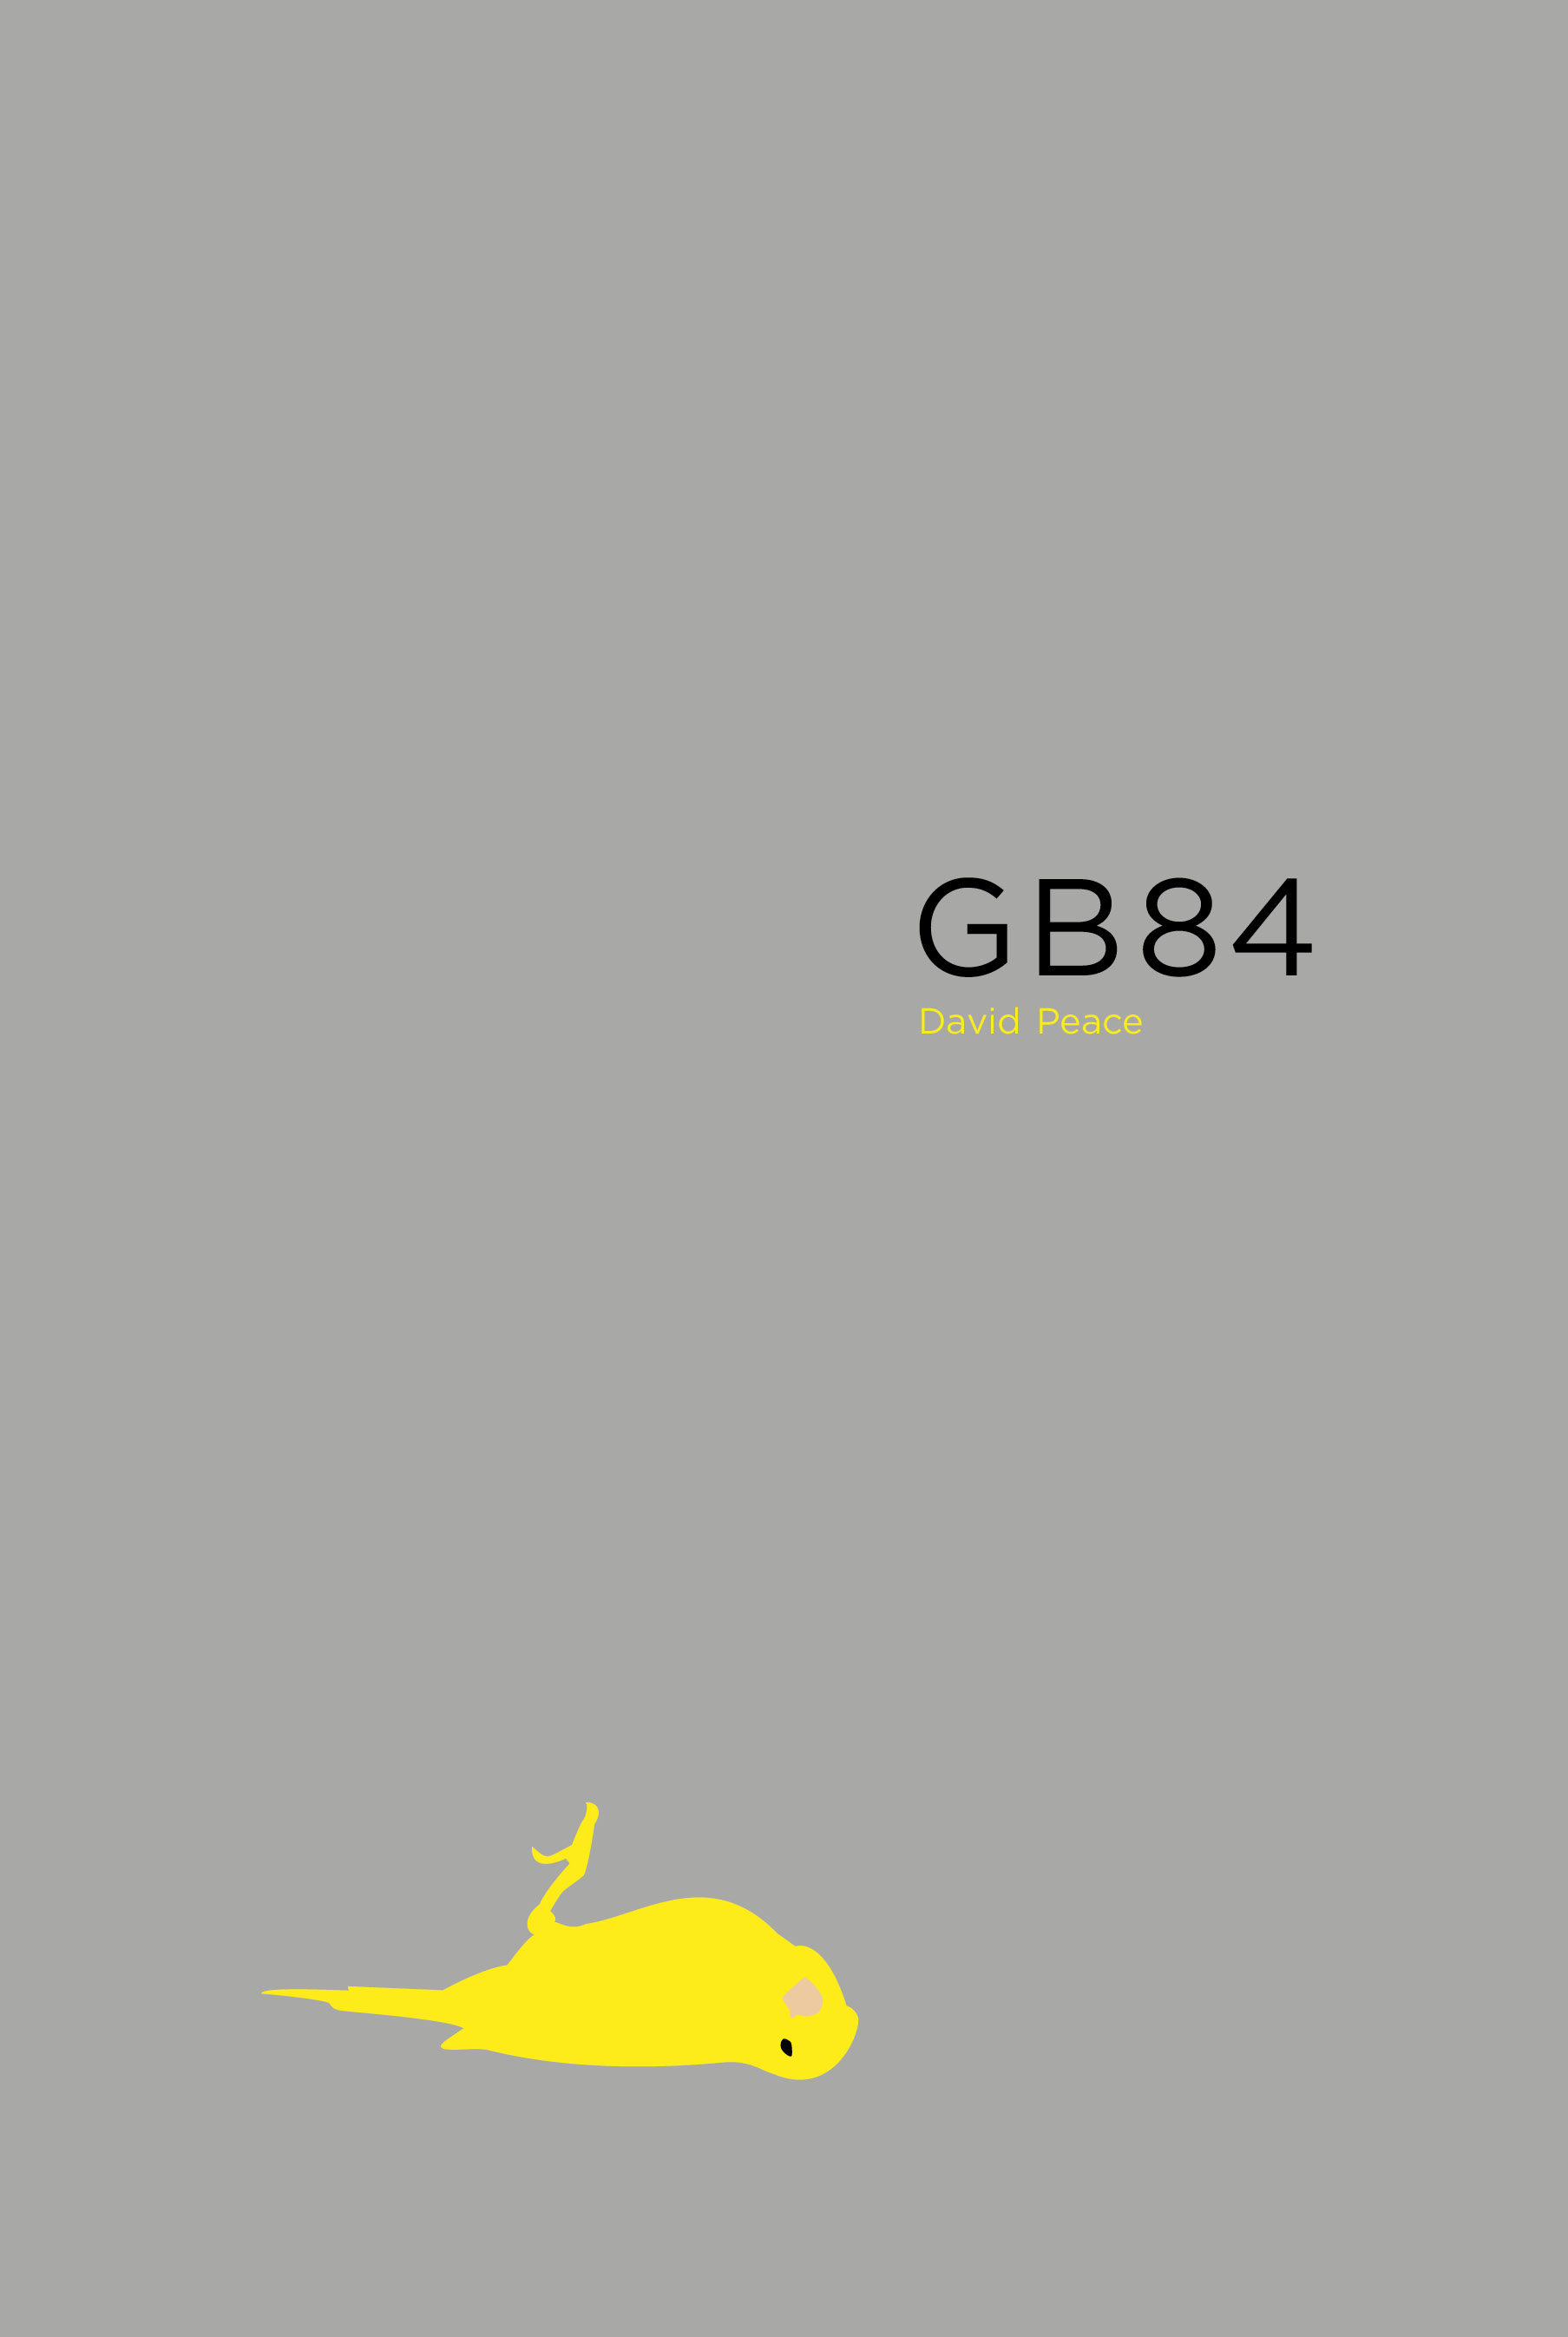 GB64_GMitchell